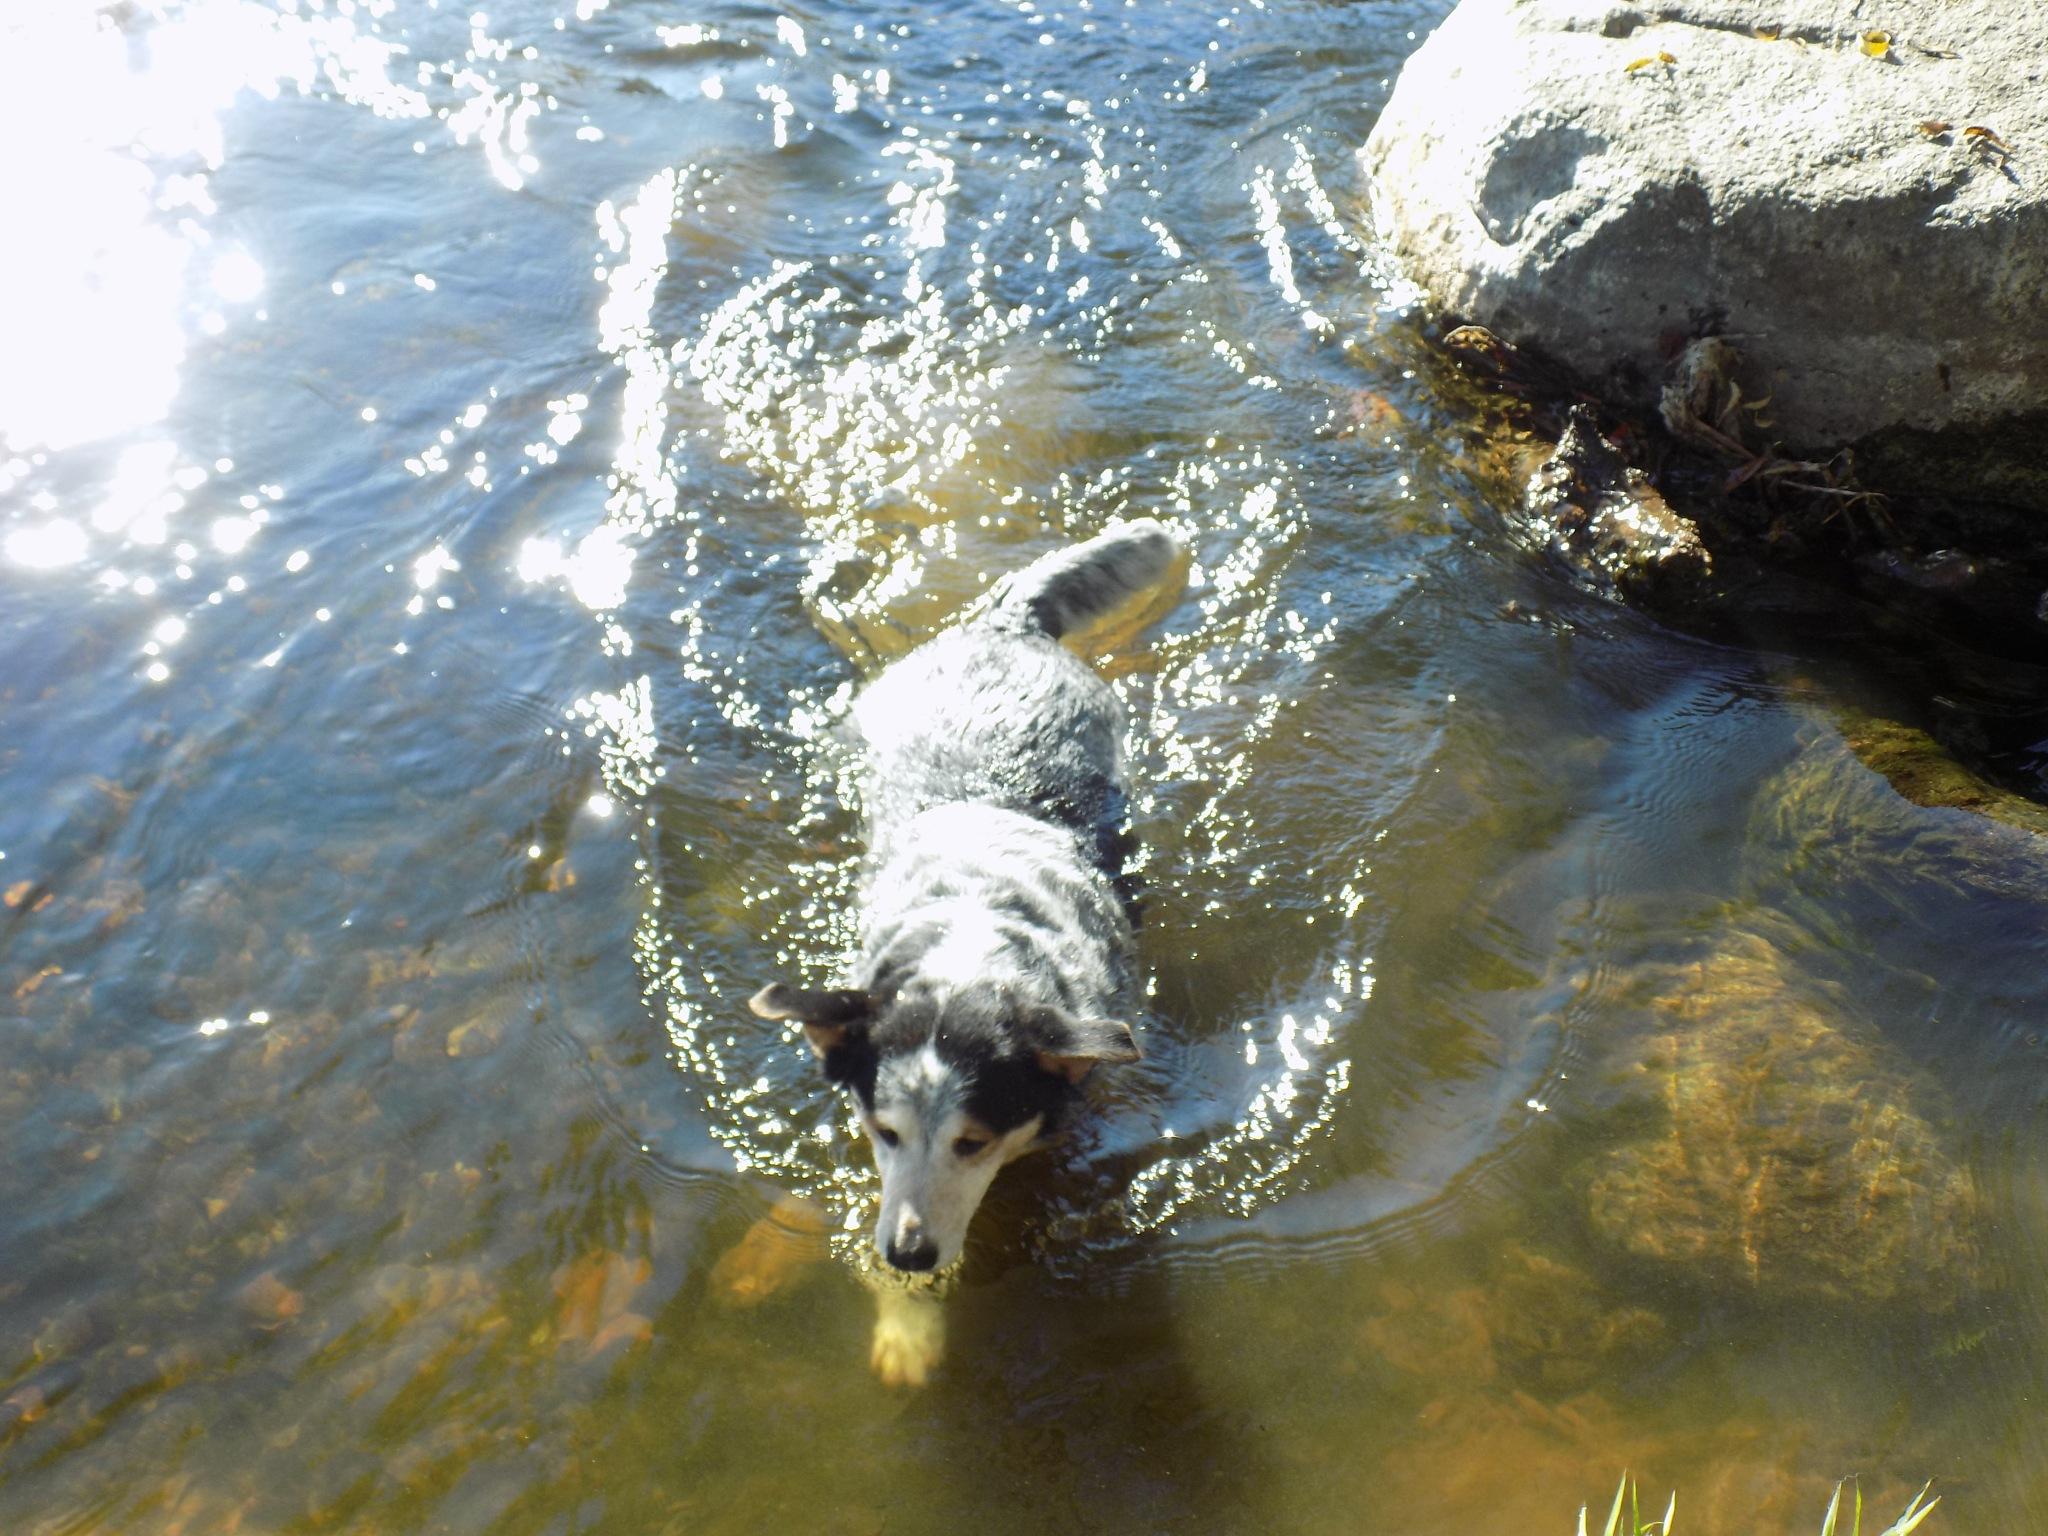 My dod likes to swim. by uzkuraitiene62